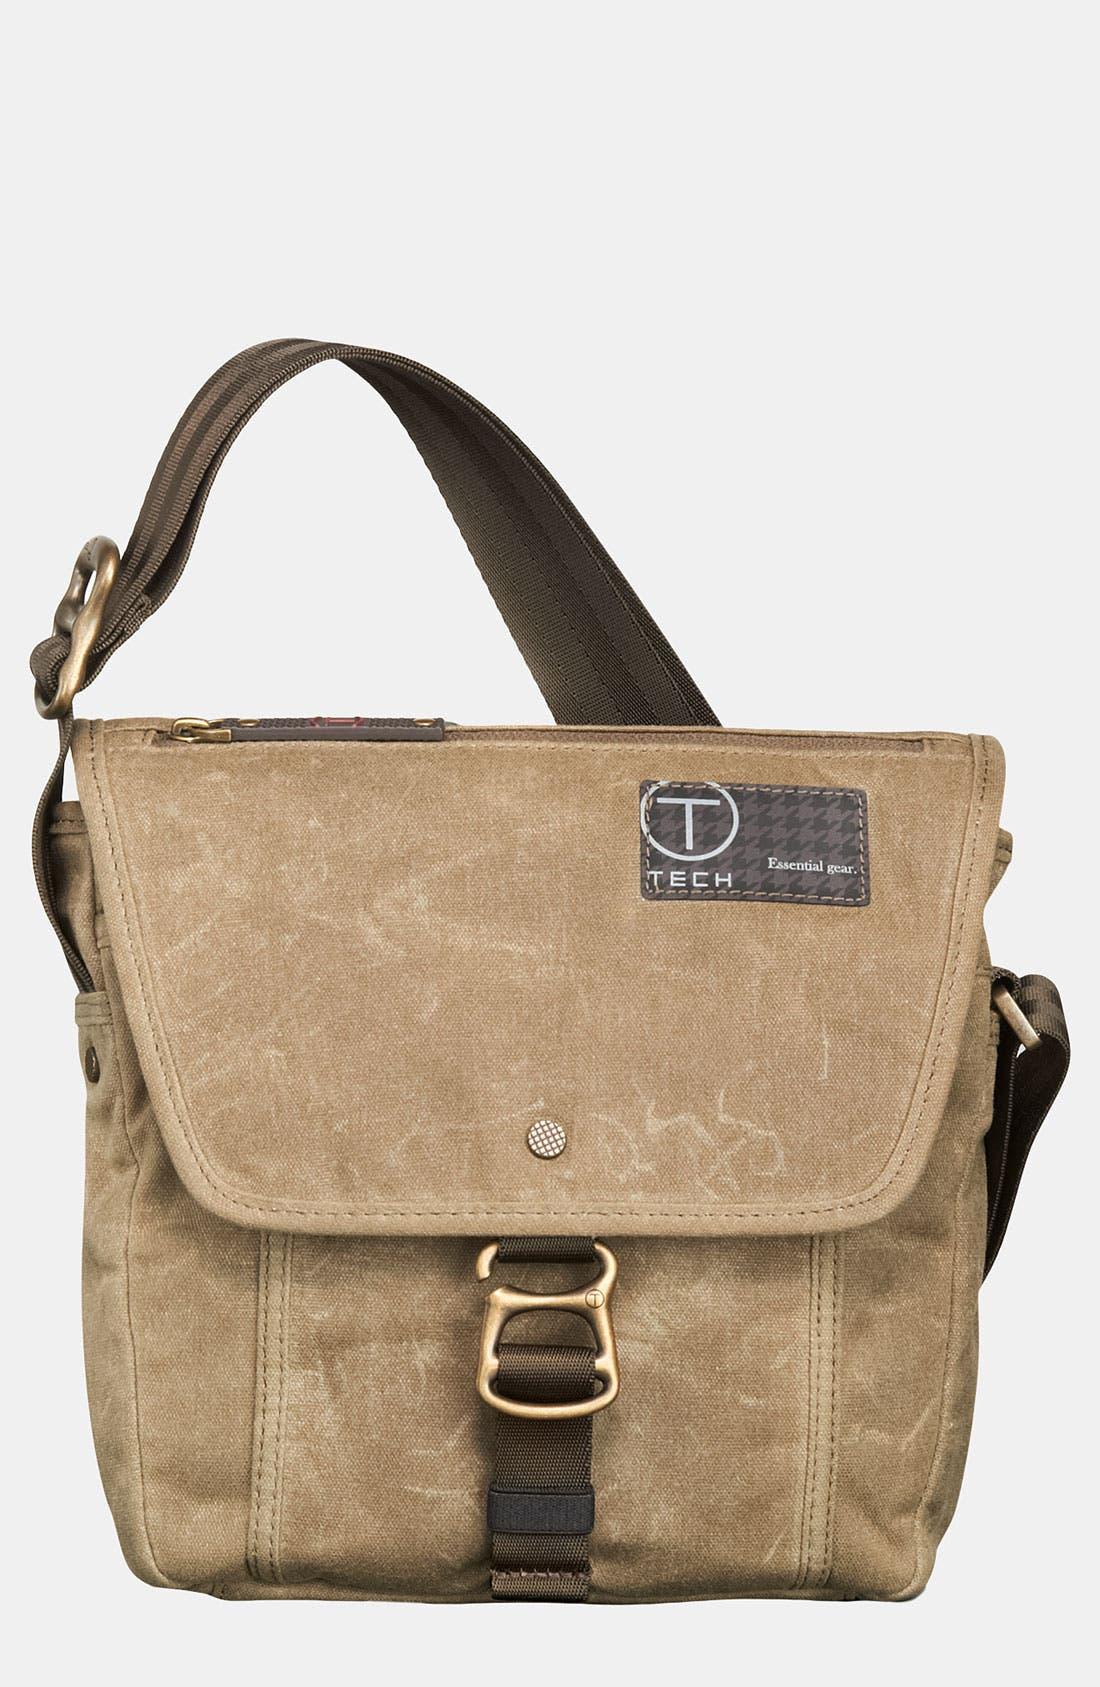 Main Image - Tumi 'T-Tech Icon - Lewis Small' Flap Crossbody Bag